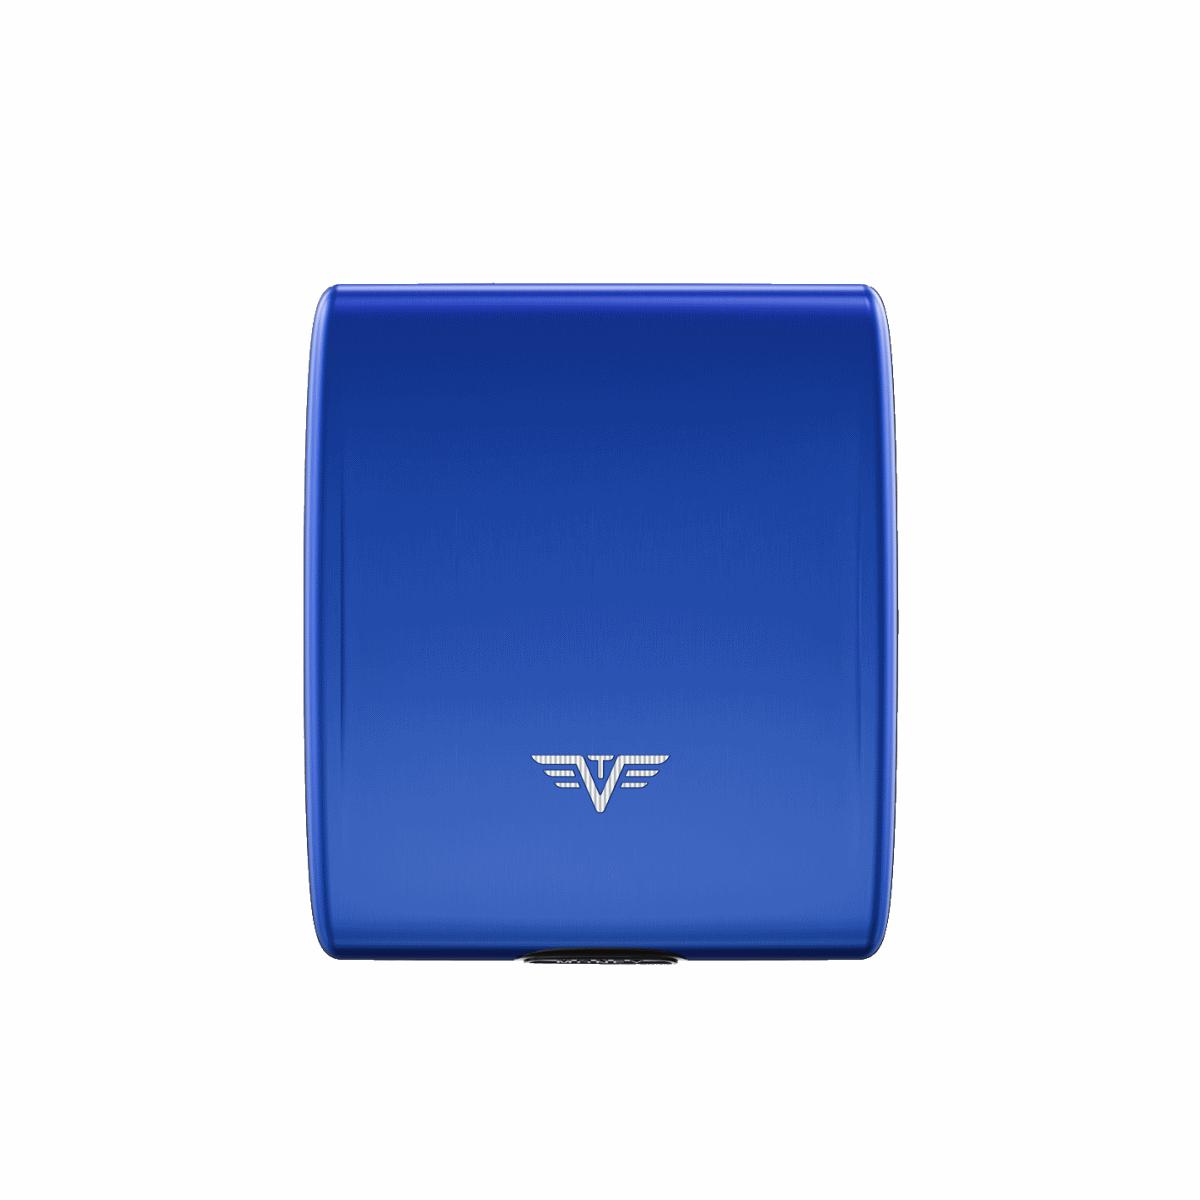 TRU VIRTU Aluminum Wallet Beluga - Money & Cards - Blue